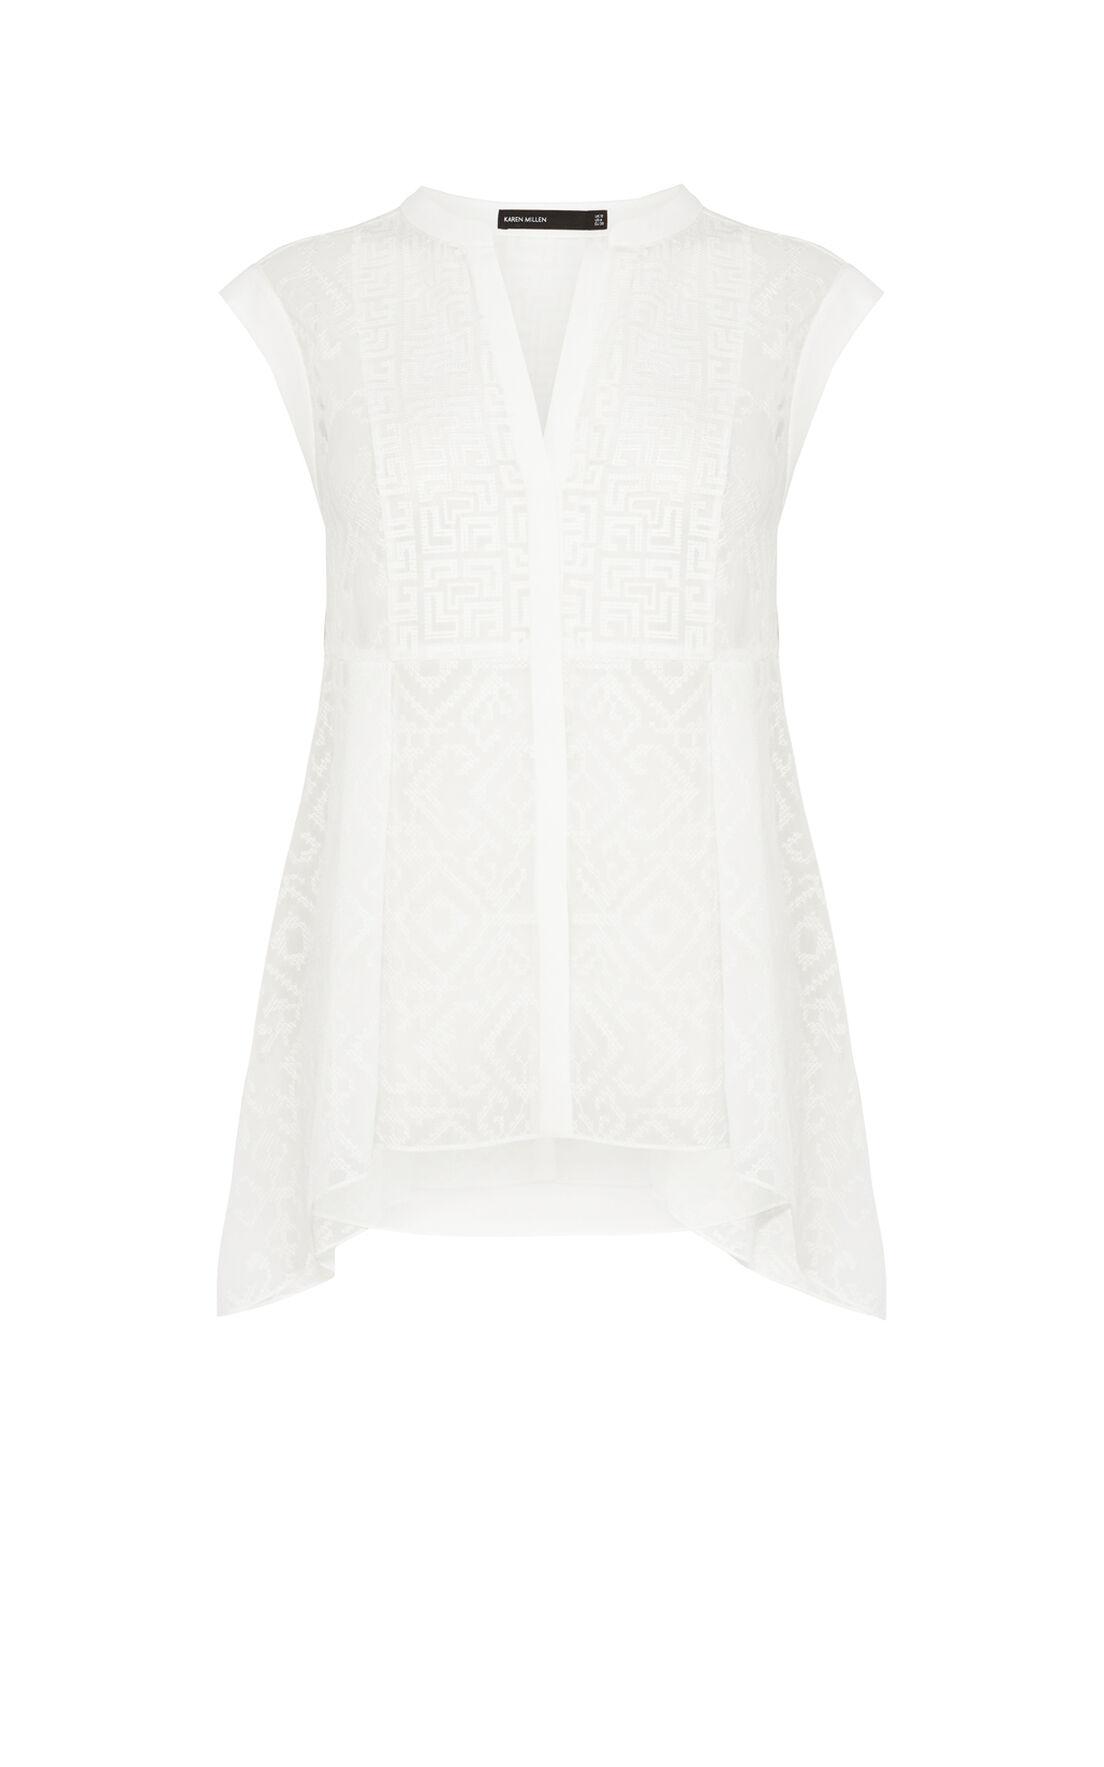 Karen Millen, Softly tailored embroidered vo White 0